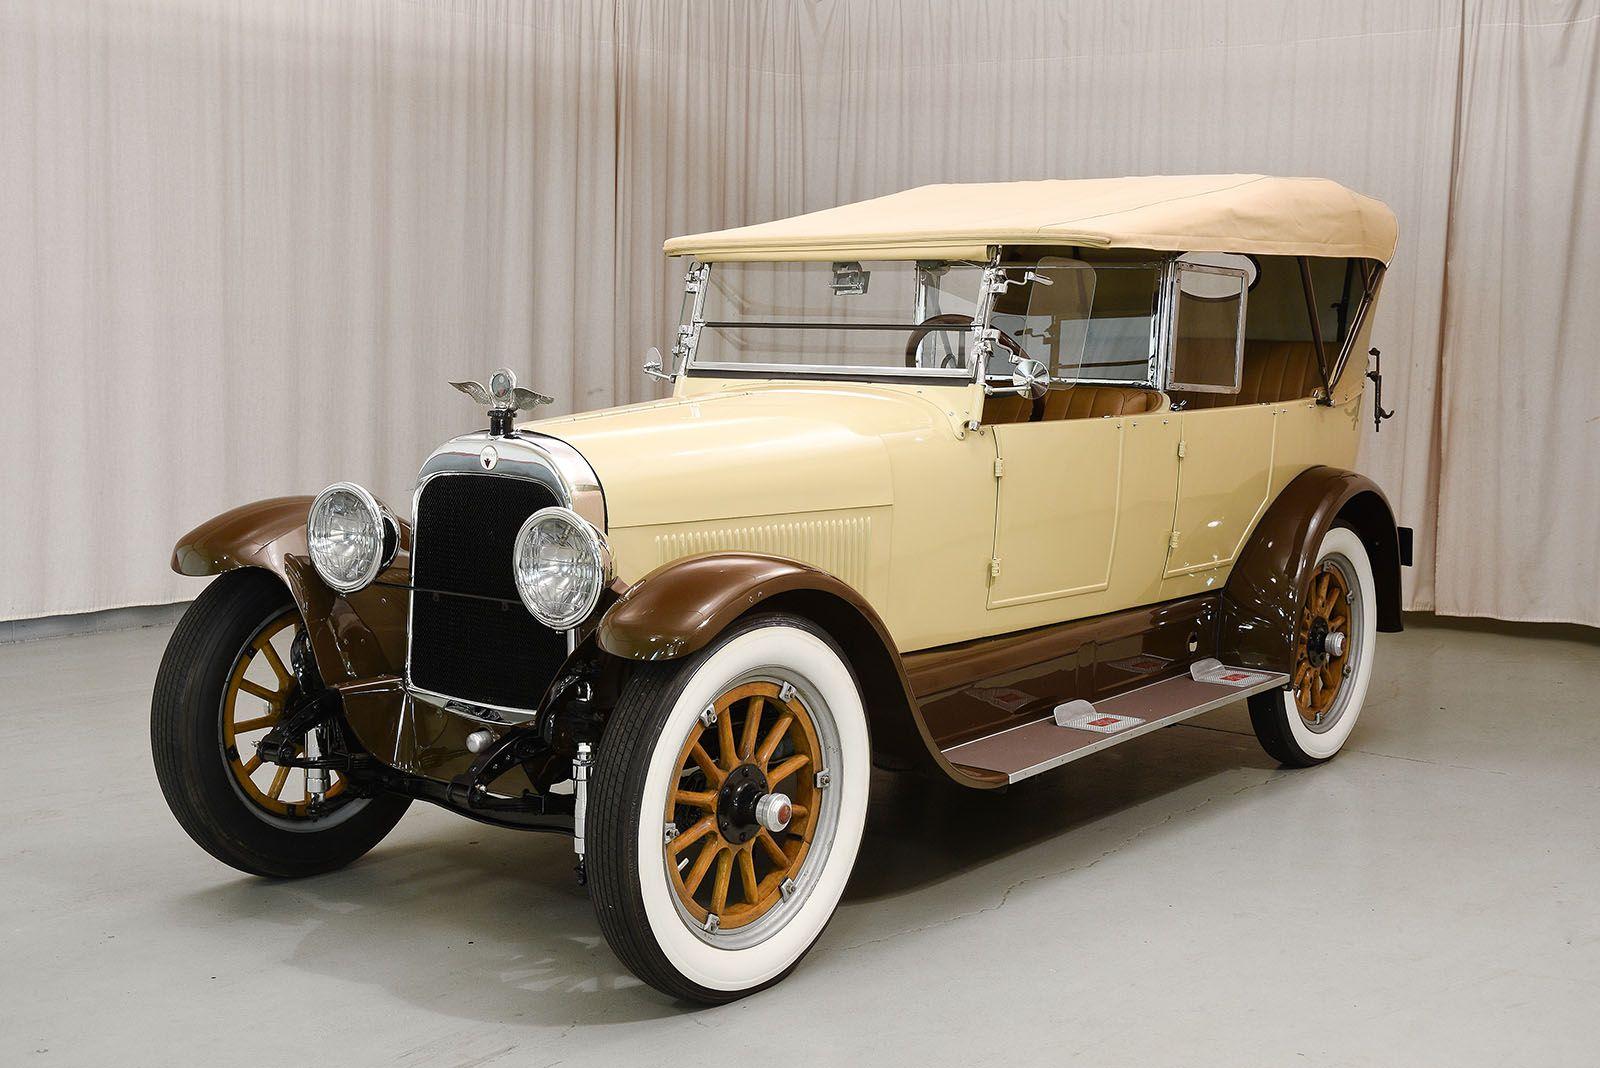 1919 Jordan Model F Touring - Hyman Ltd. Classic Cars | Jordan ...